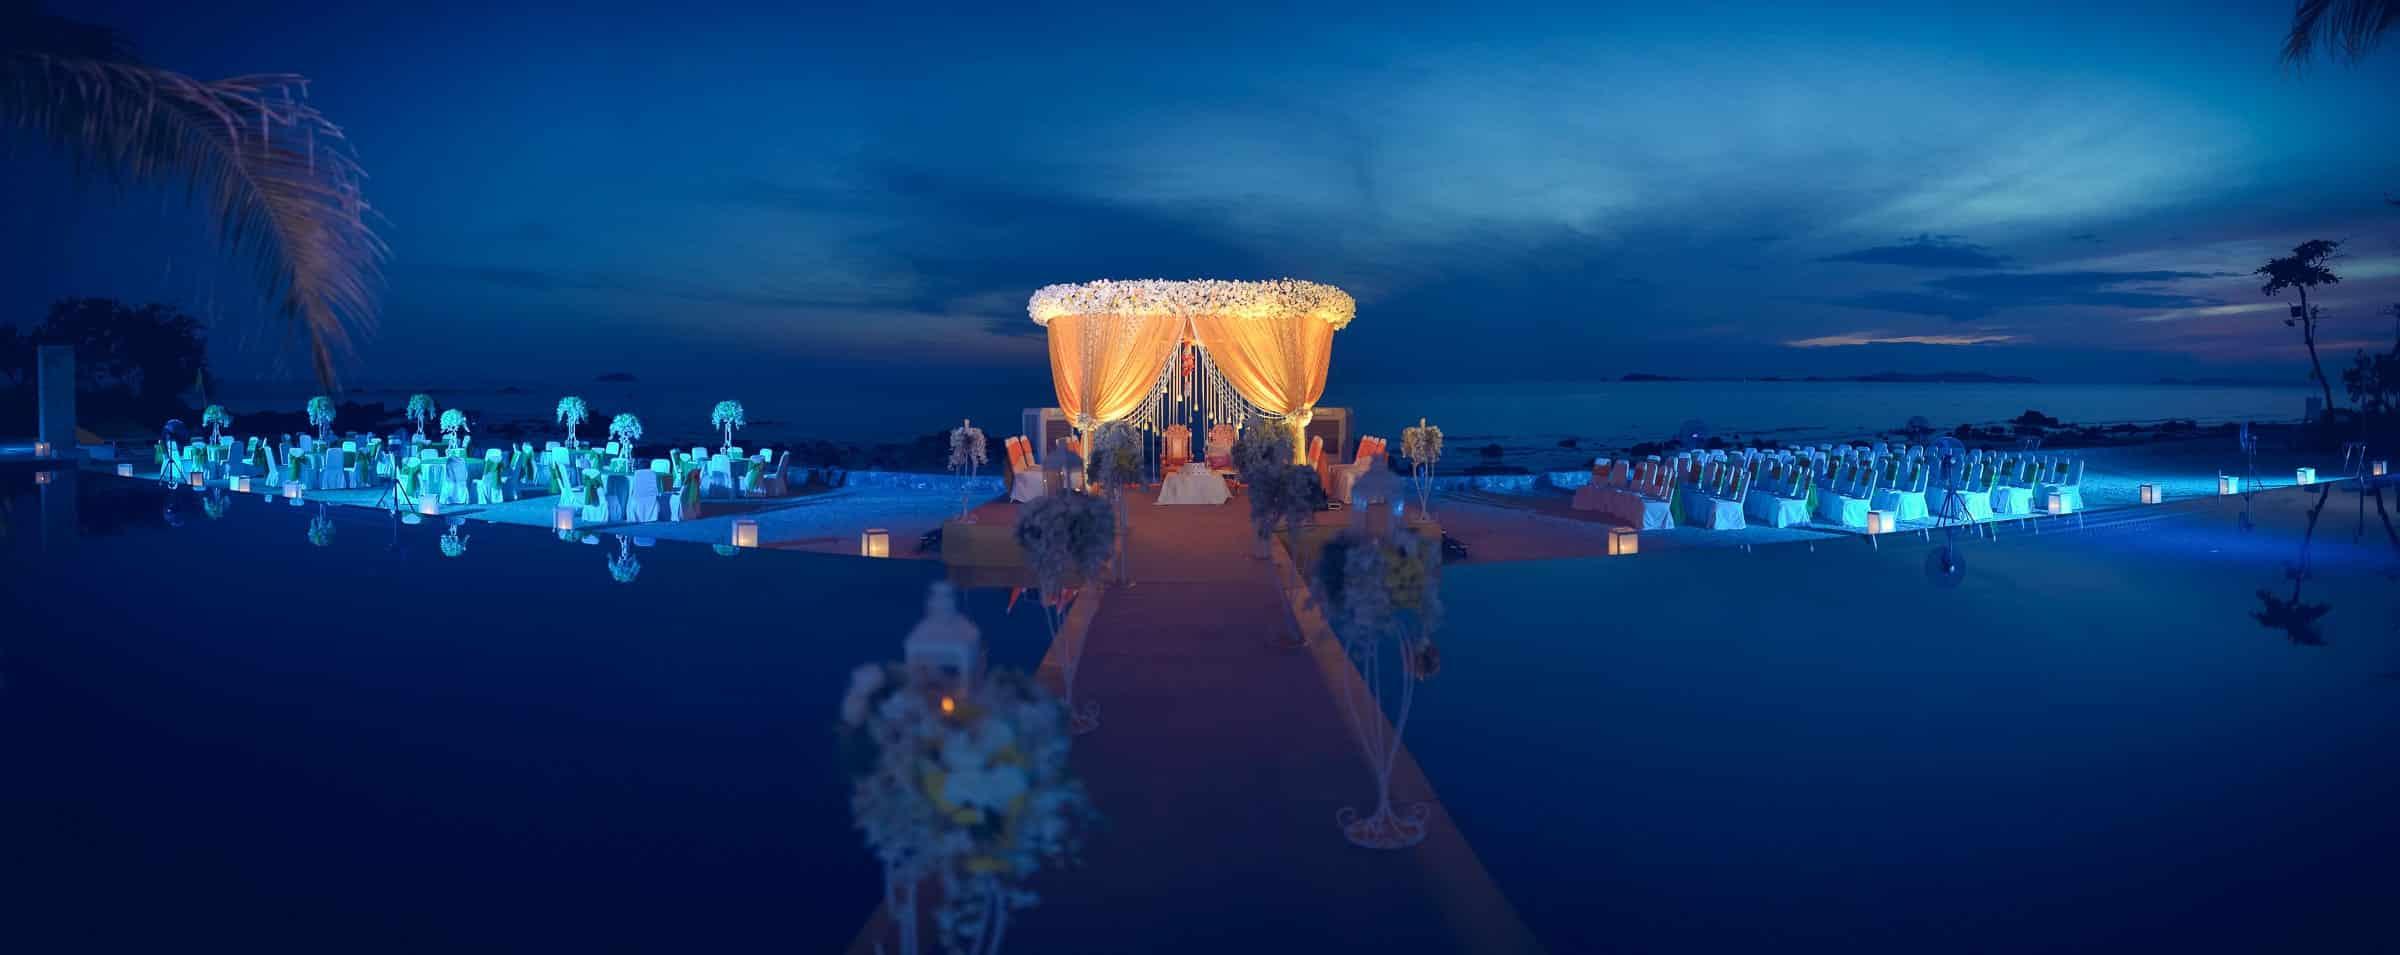 Best Destination Wedding Photographer Rayong Mariott   Indian Venue Decor Panorama Photography Thailand